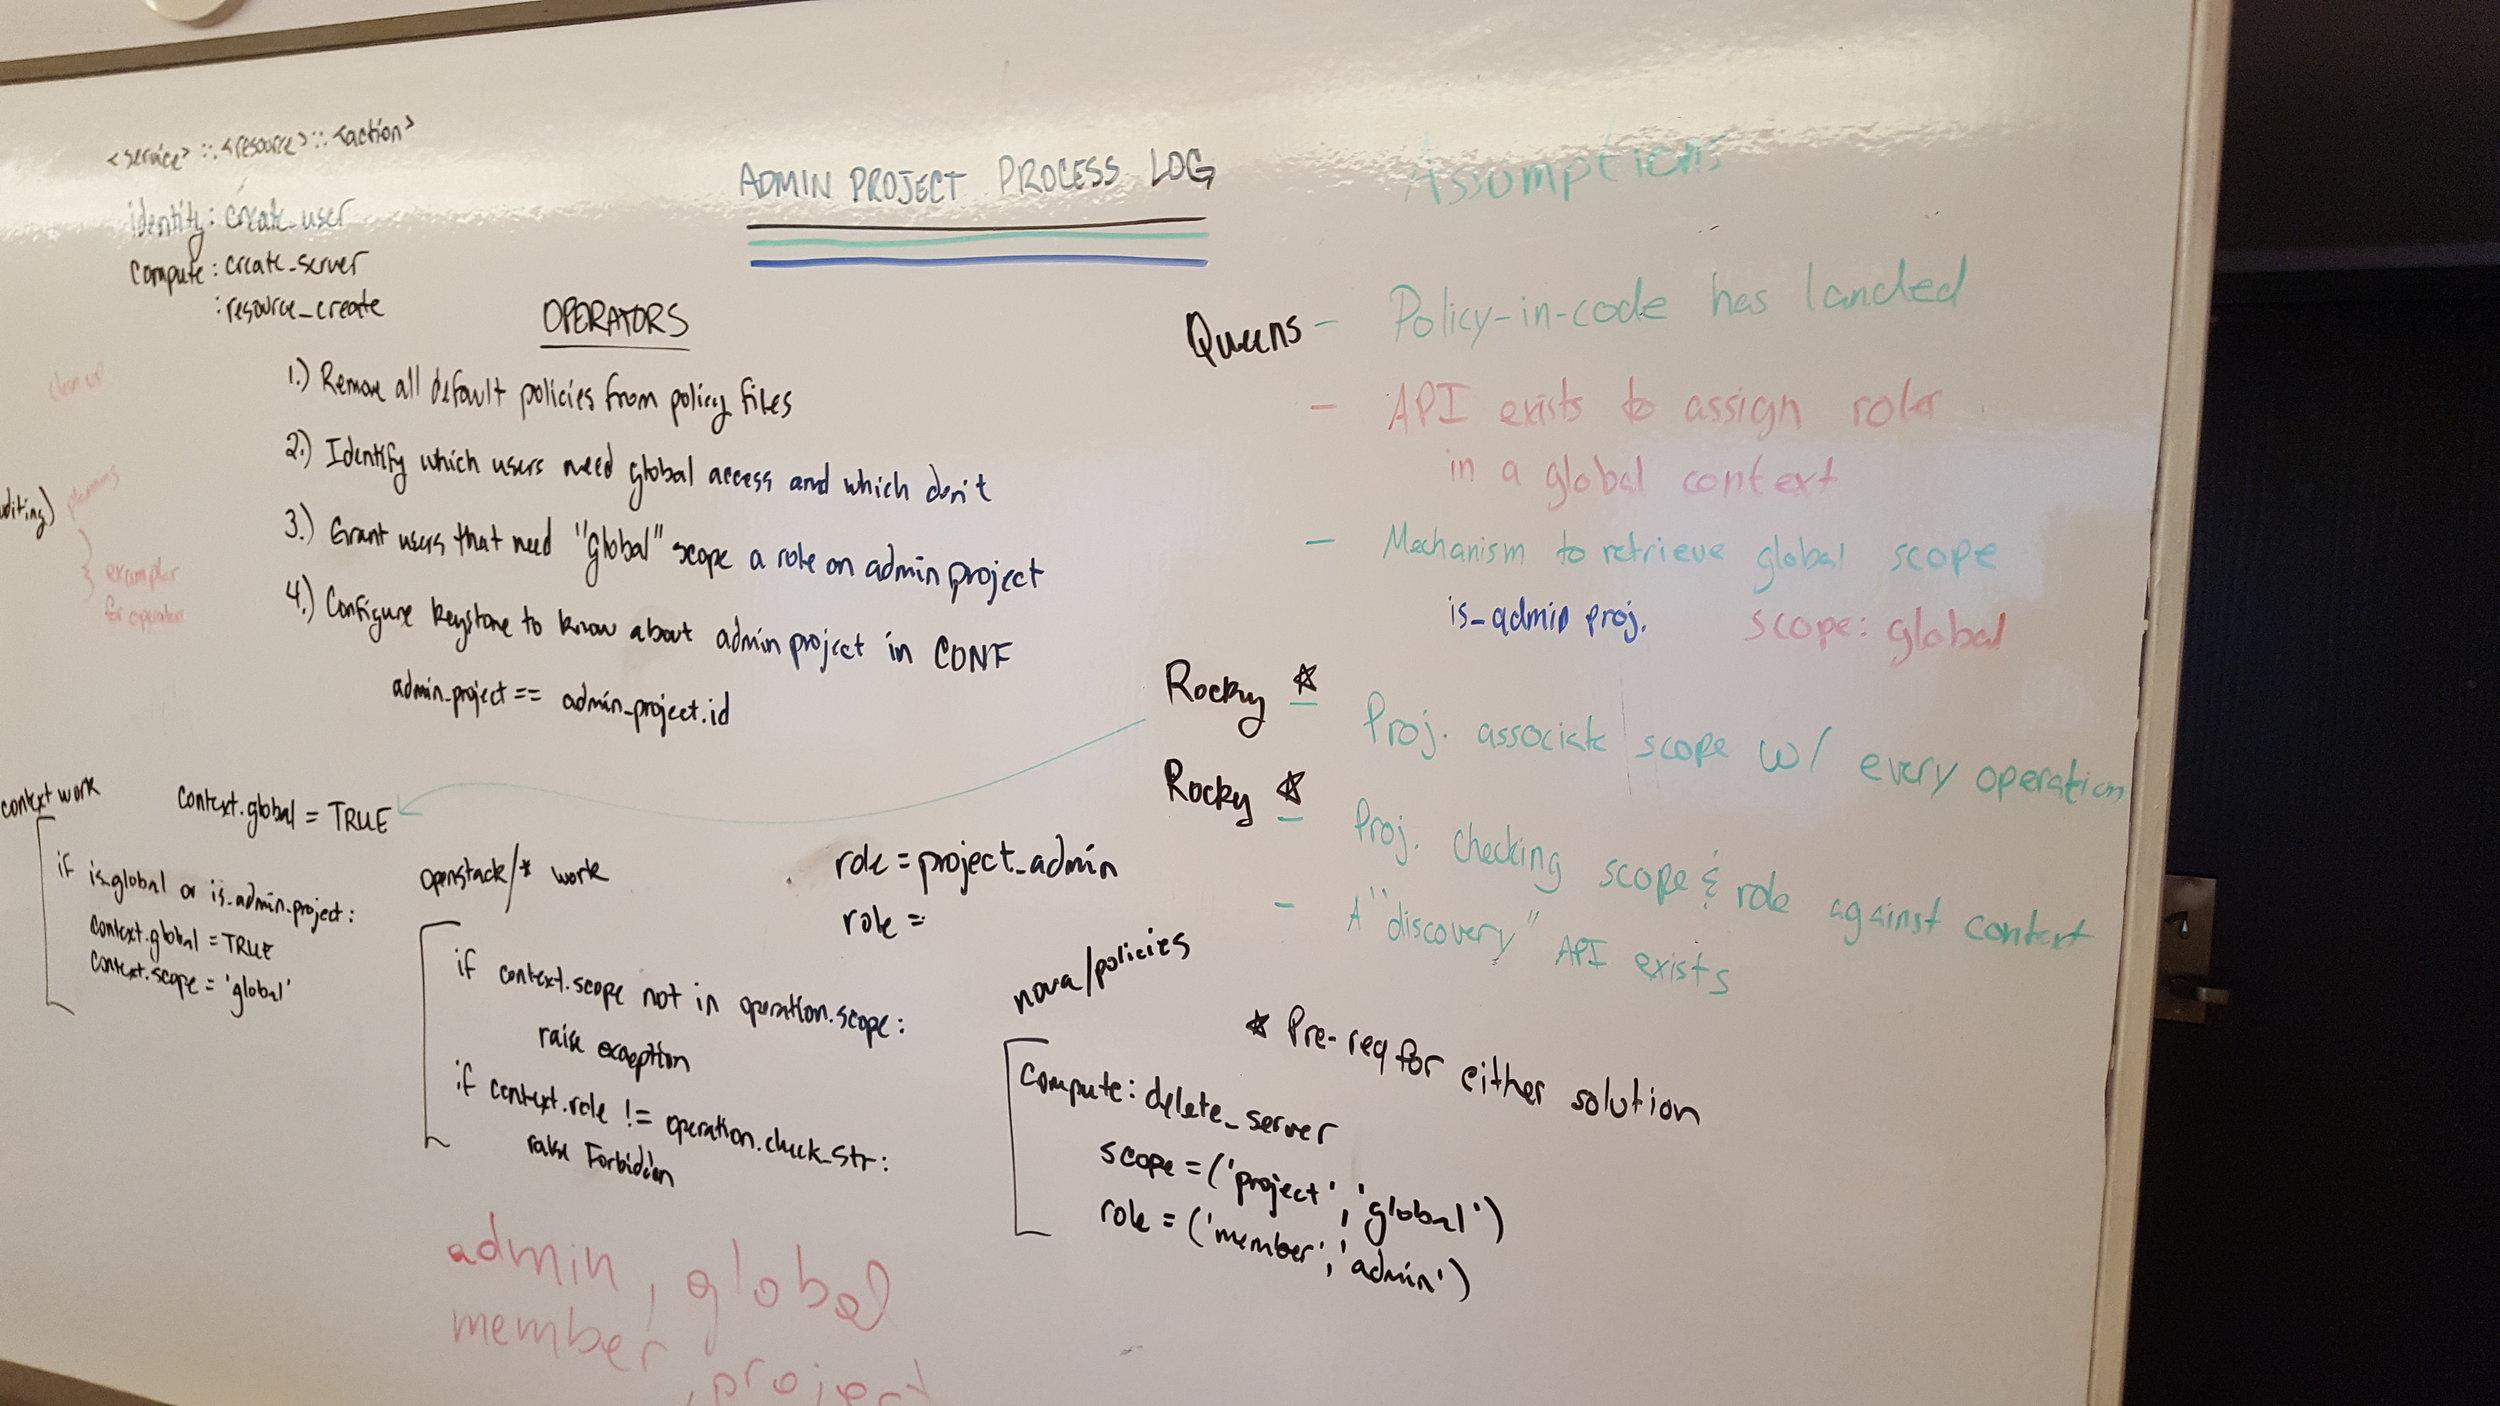 Process log for operators consuming admin project